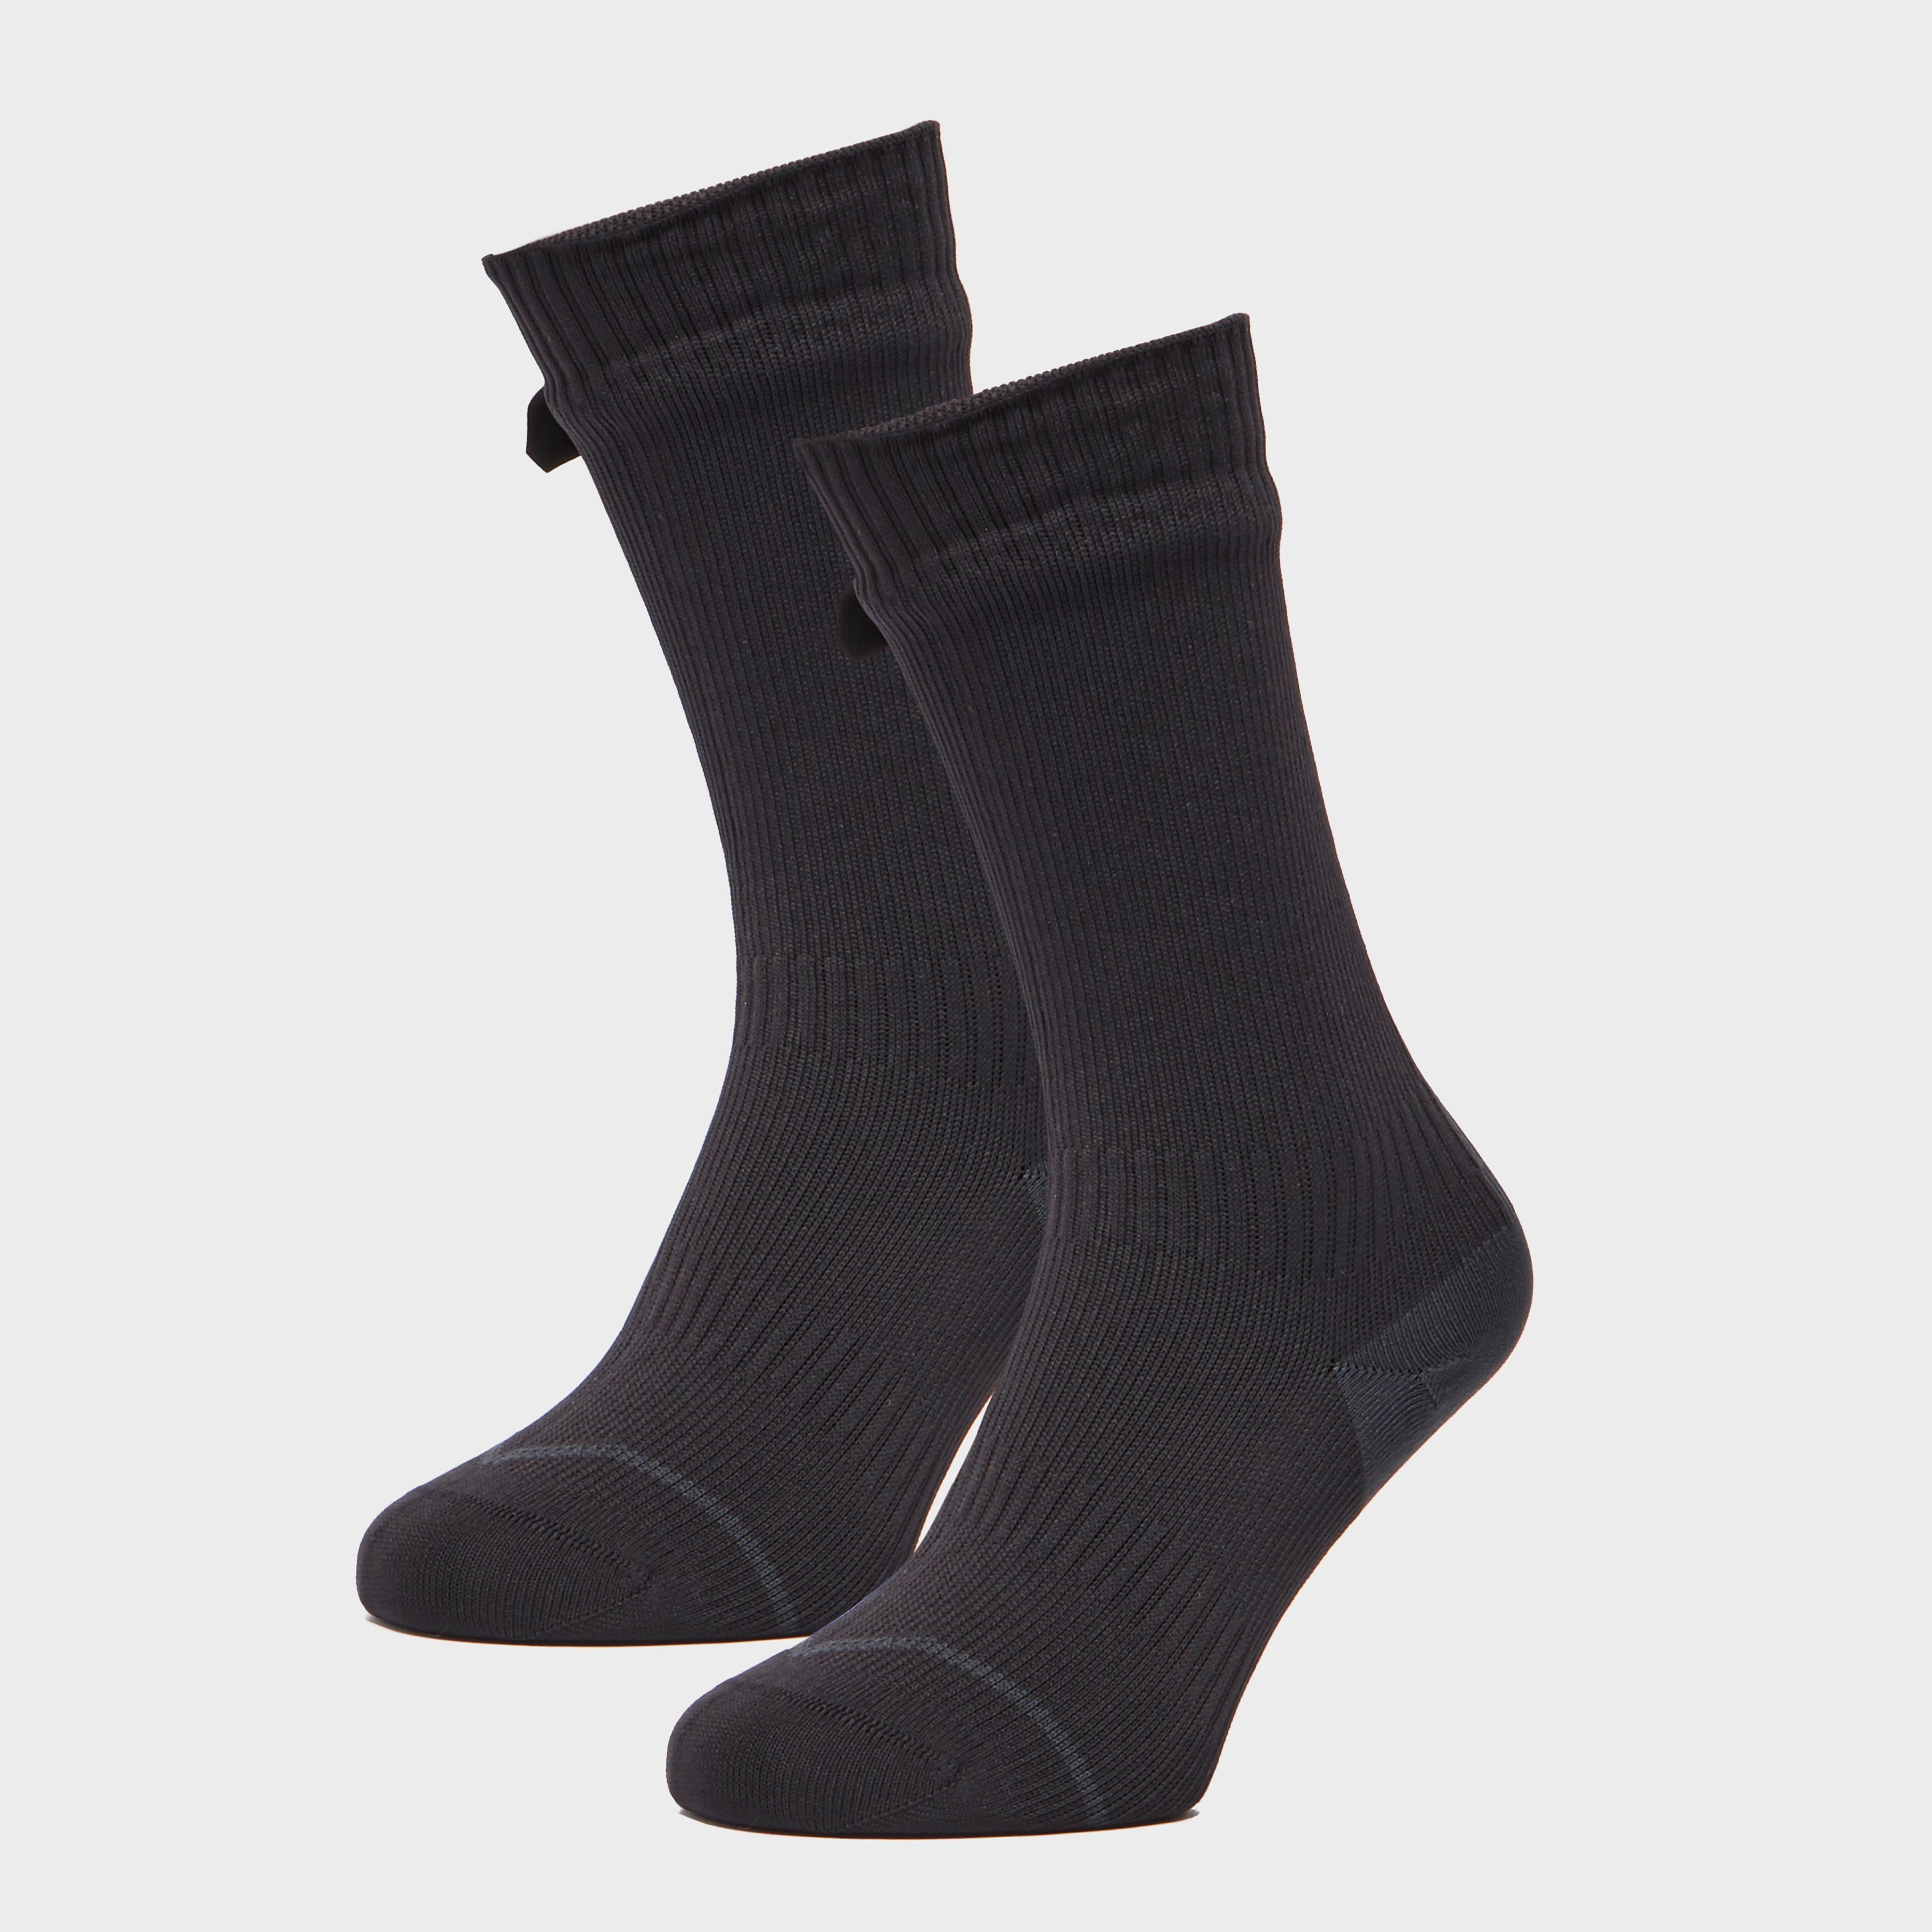 SEALSKINZ Men's Road Thin Mid Hydrostop Socks